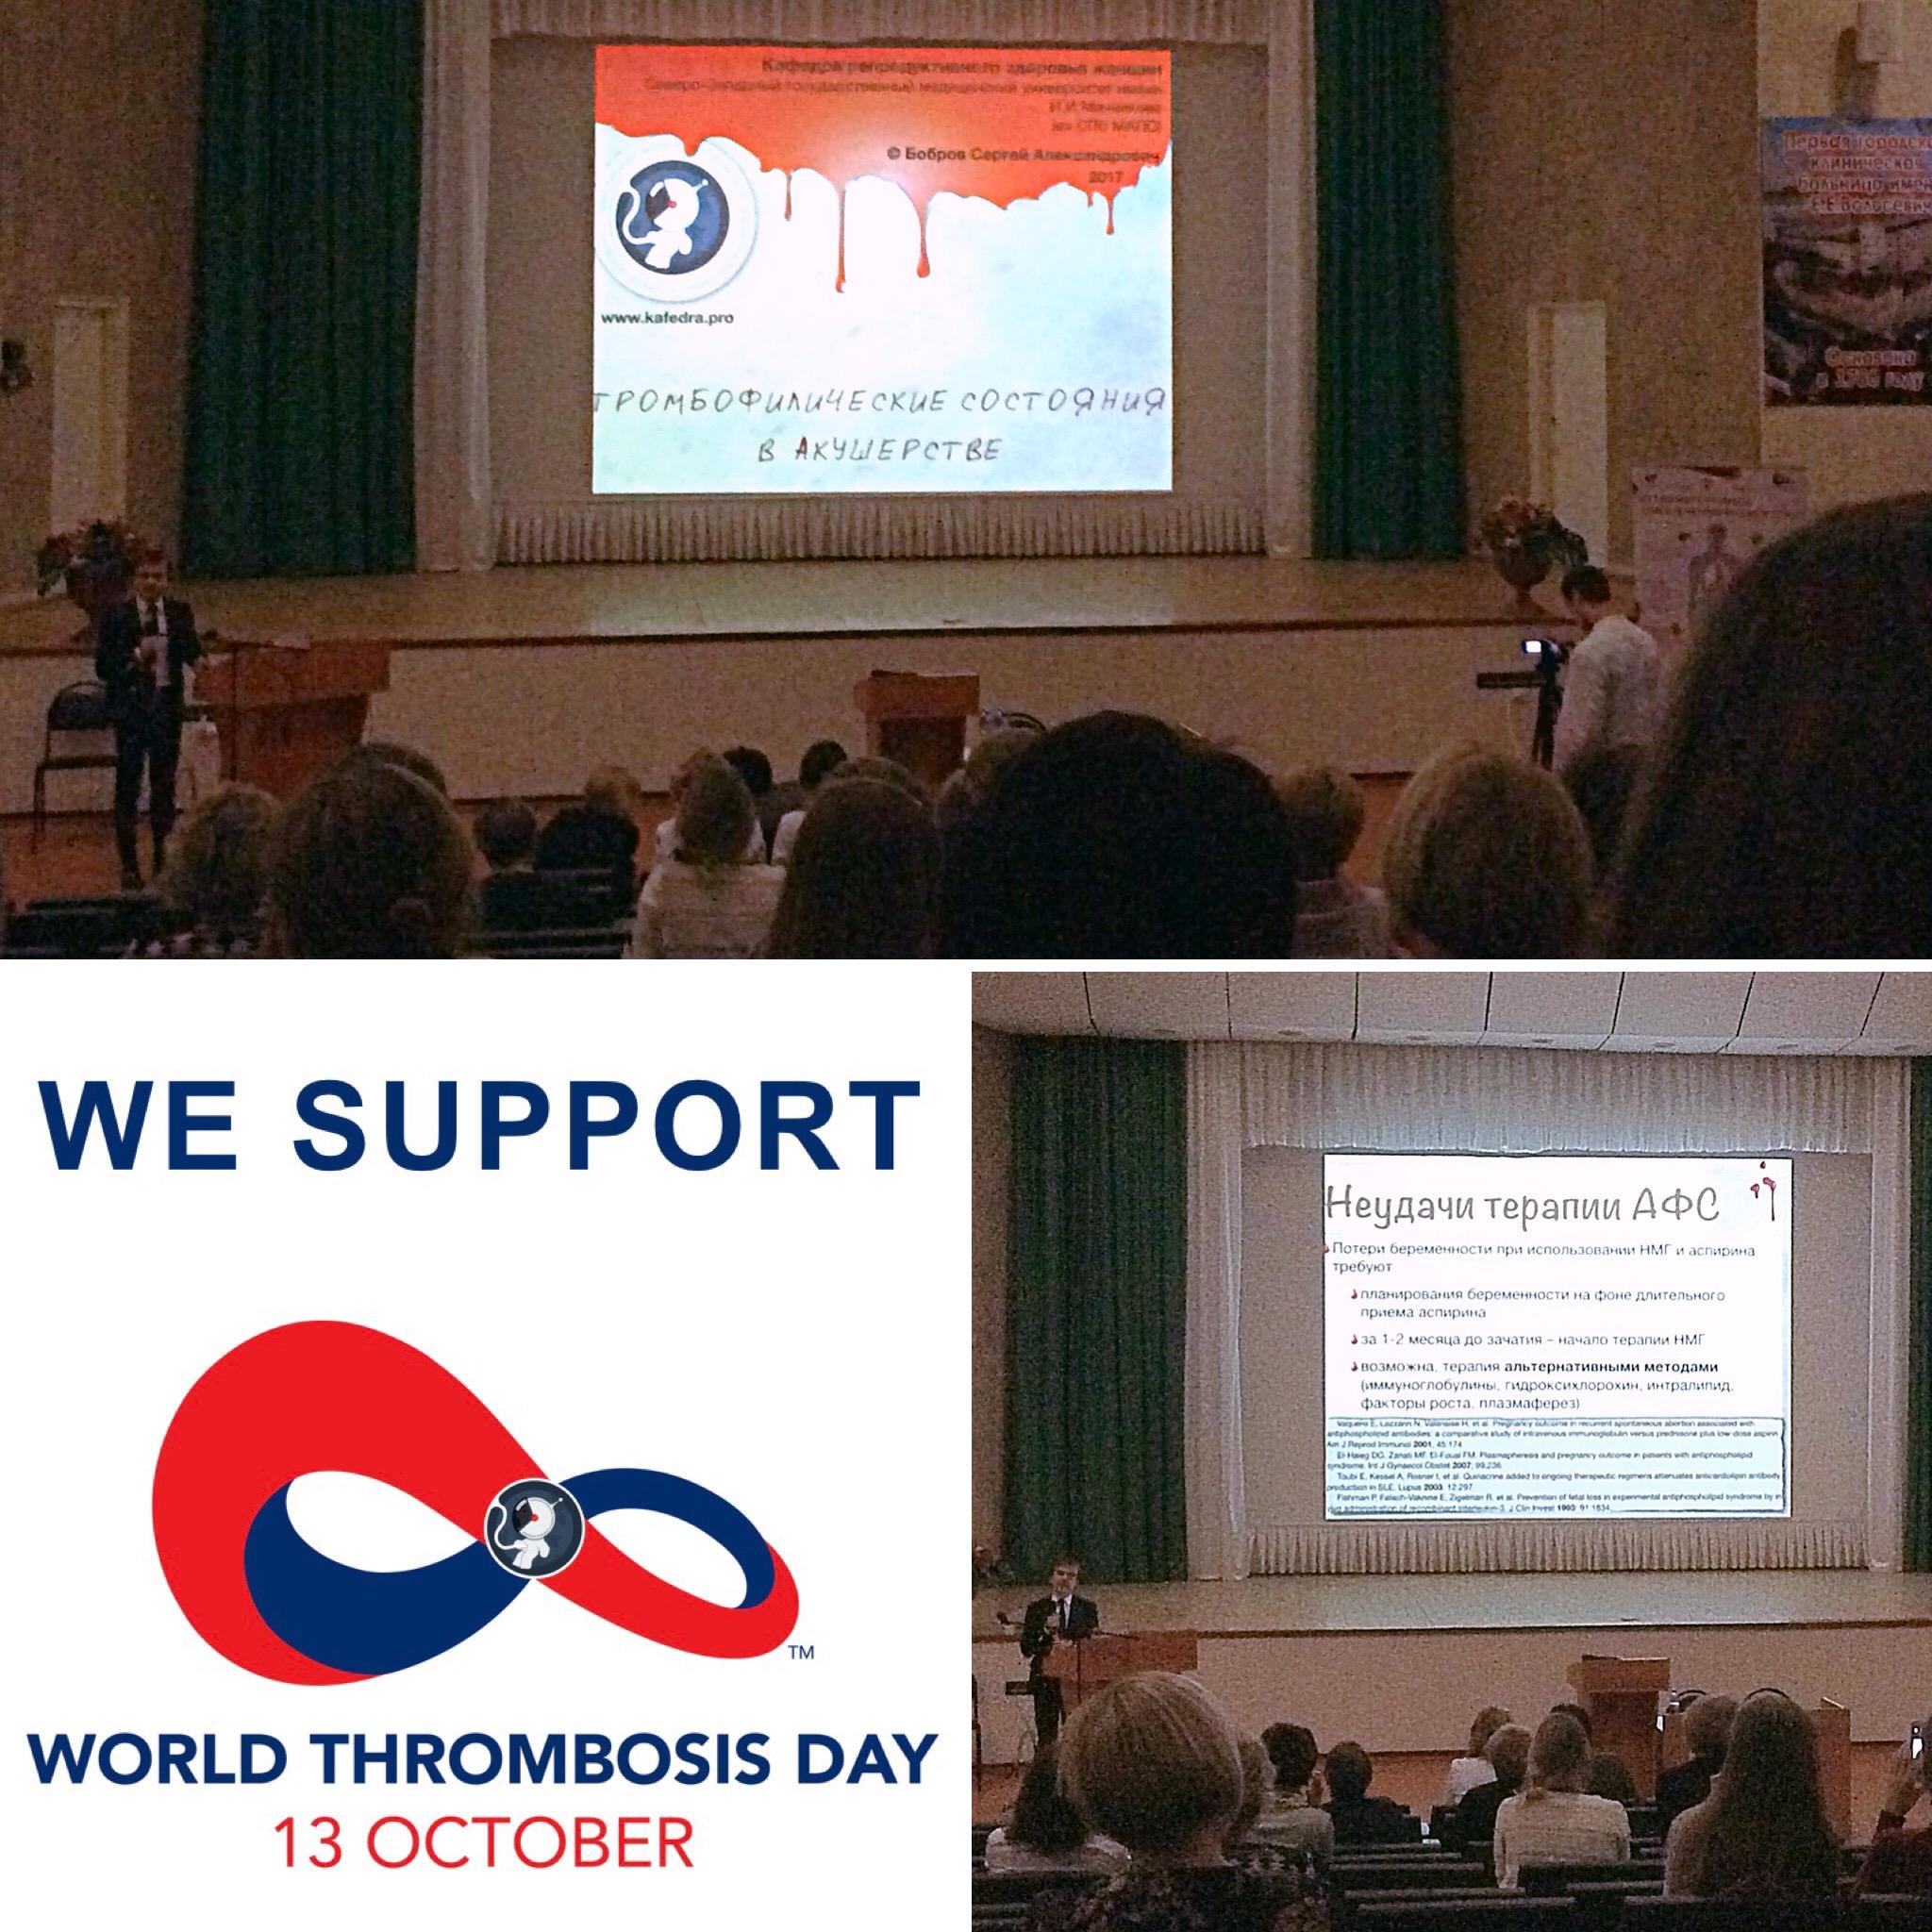 World Thrombosis day 2017